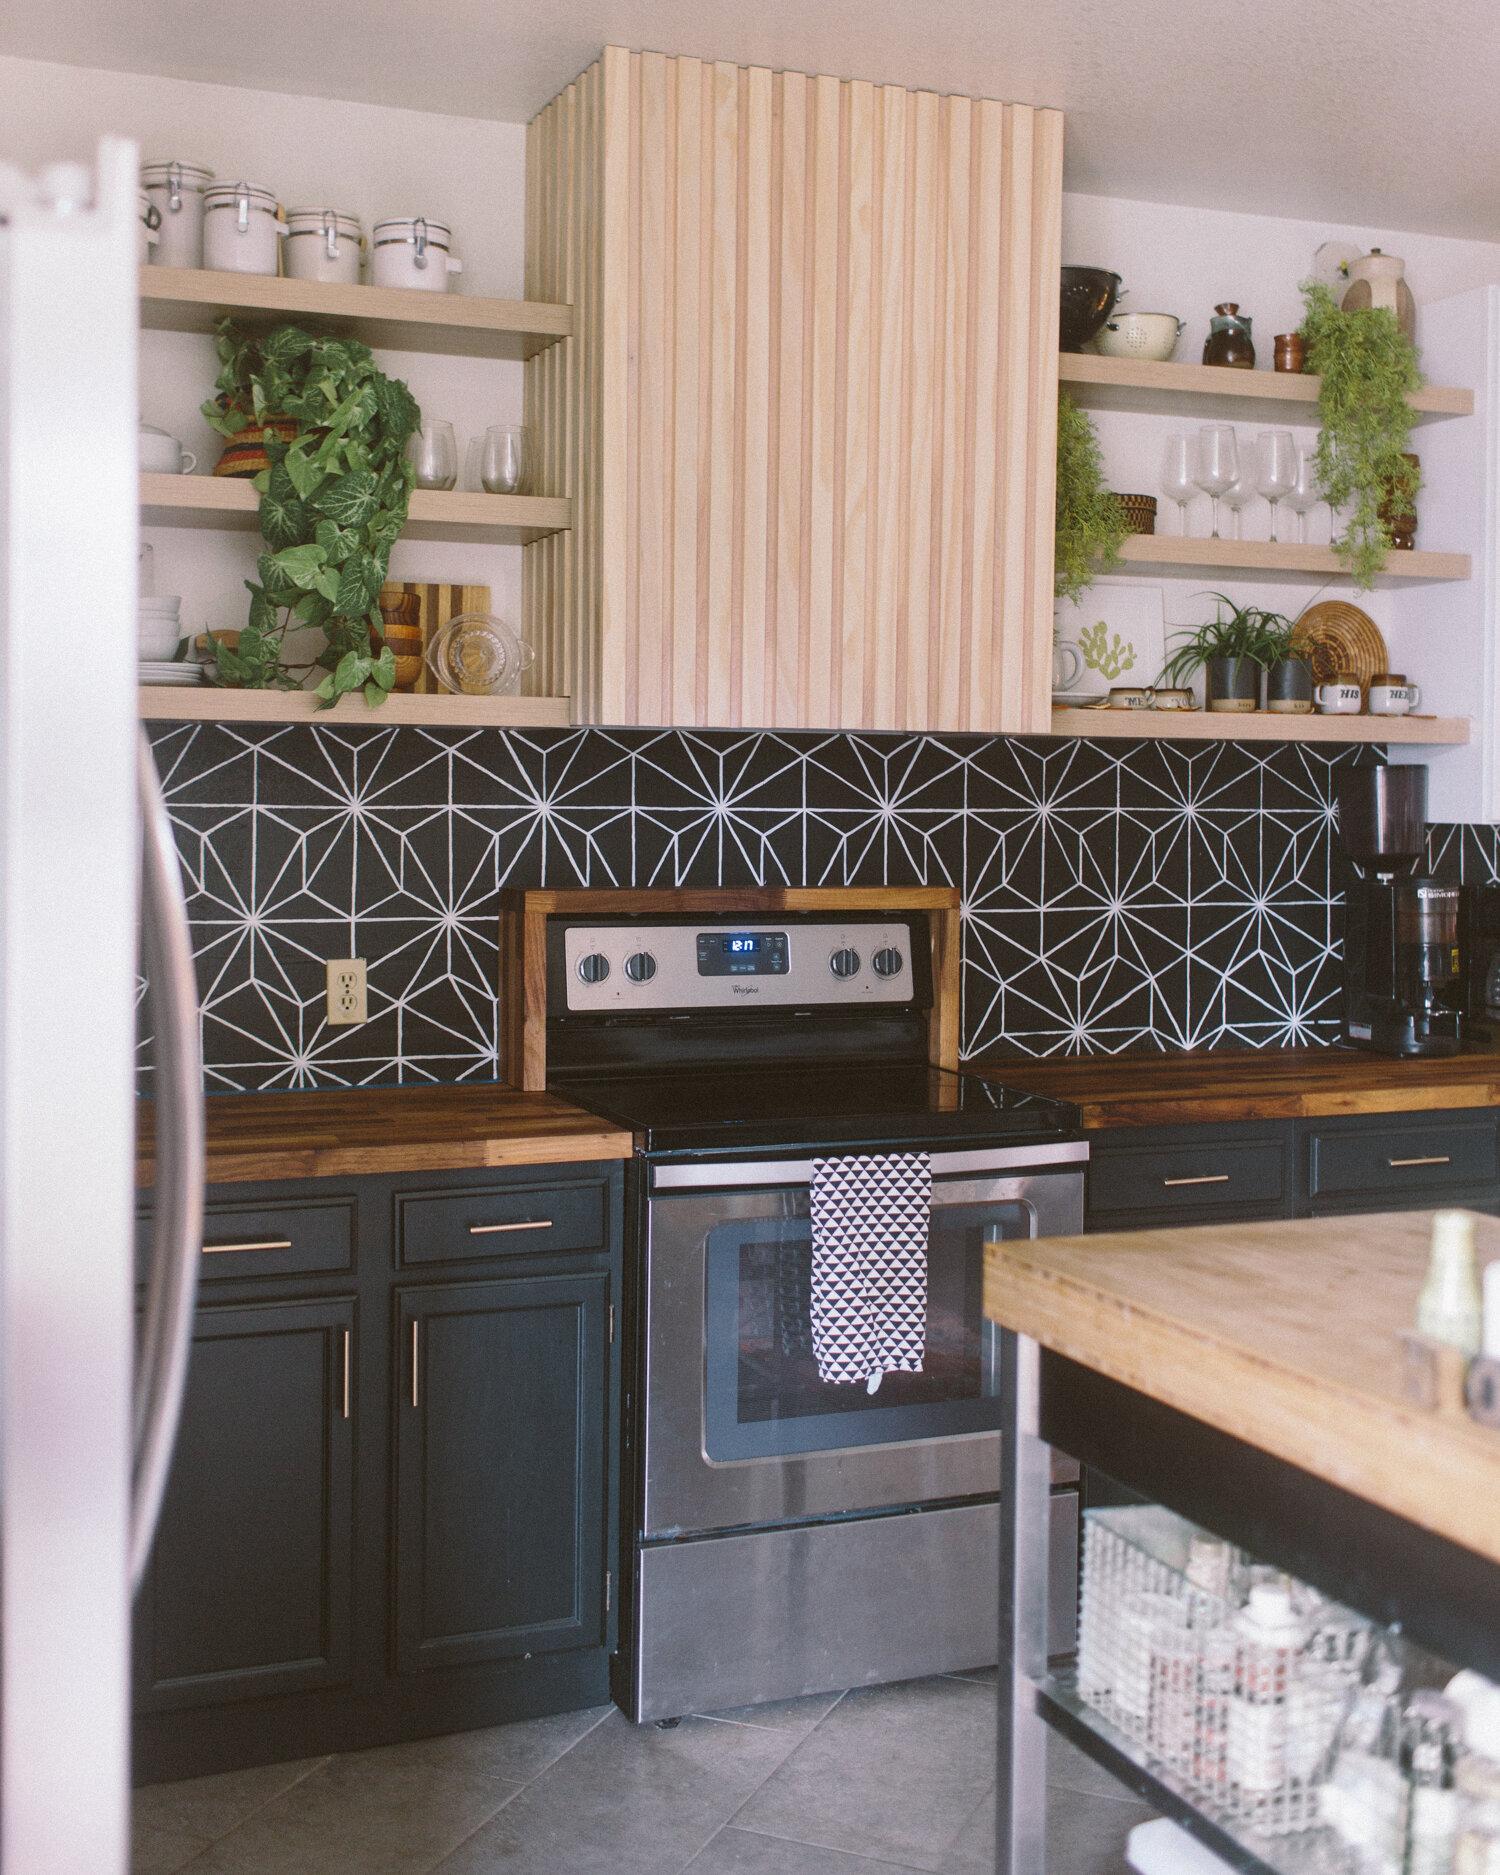 diy painted faux tile backsplash liz morrow